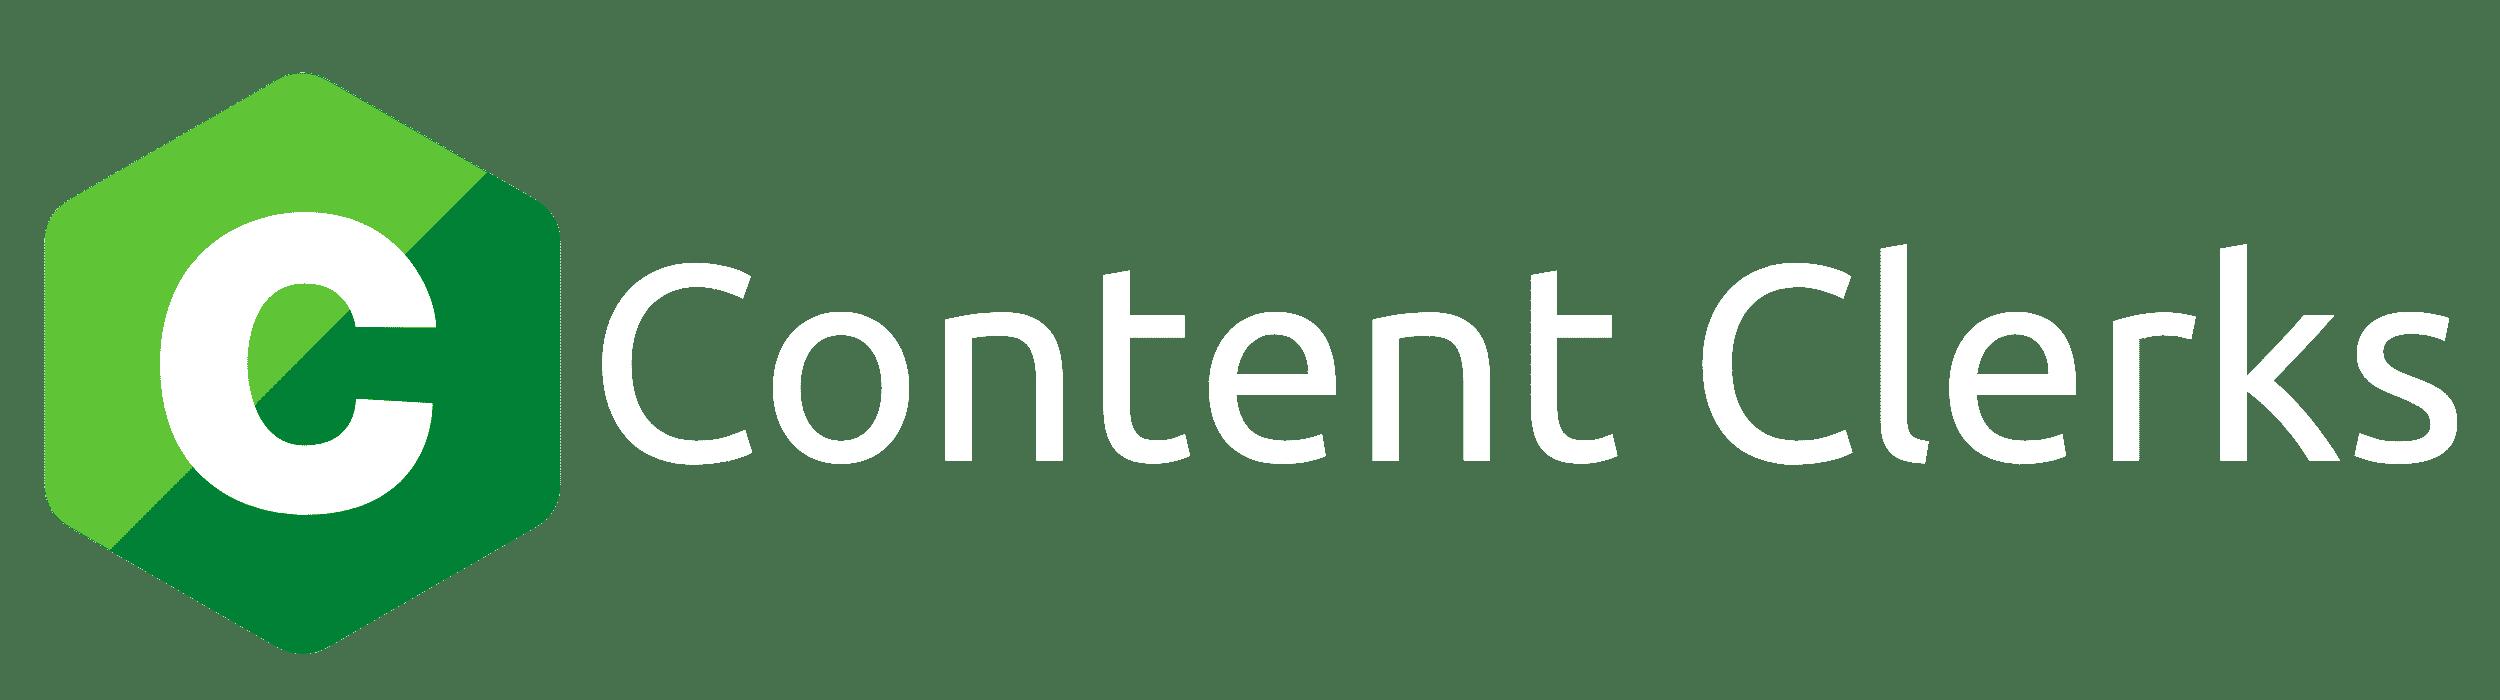 Content Clerks Logo